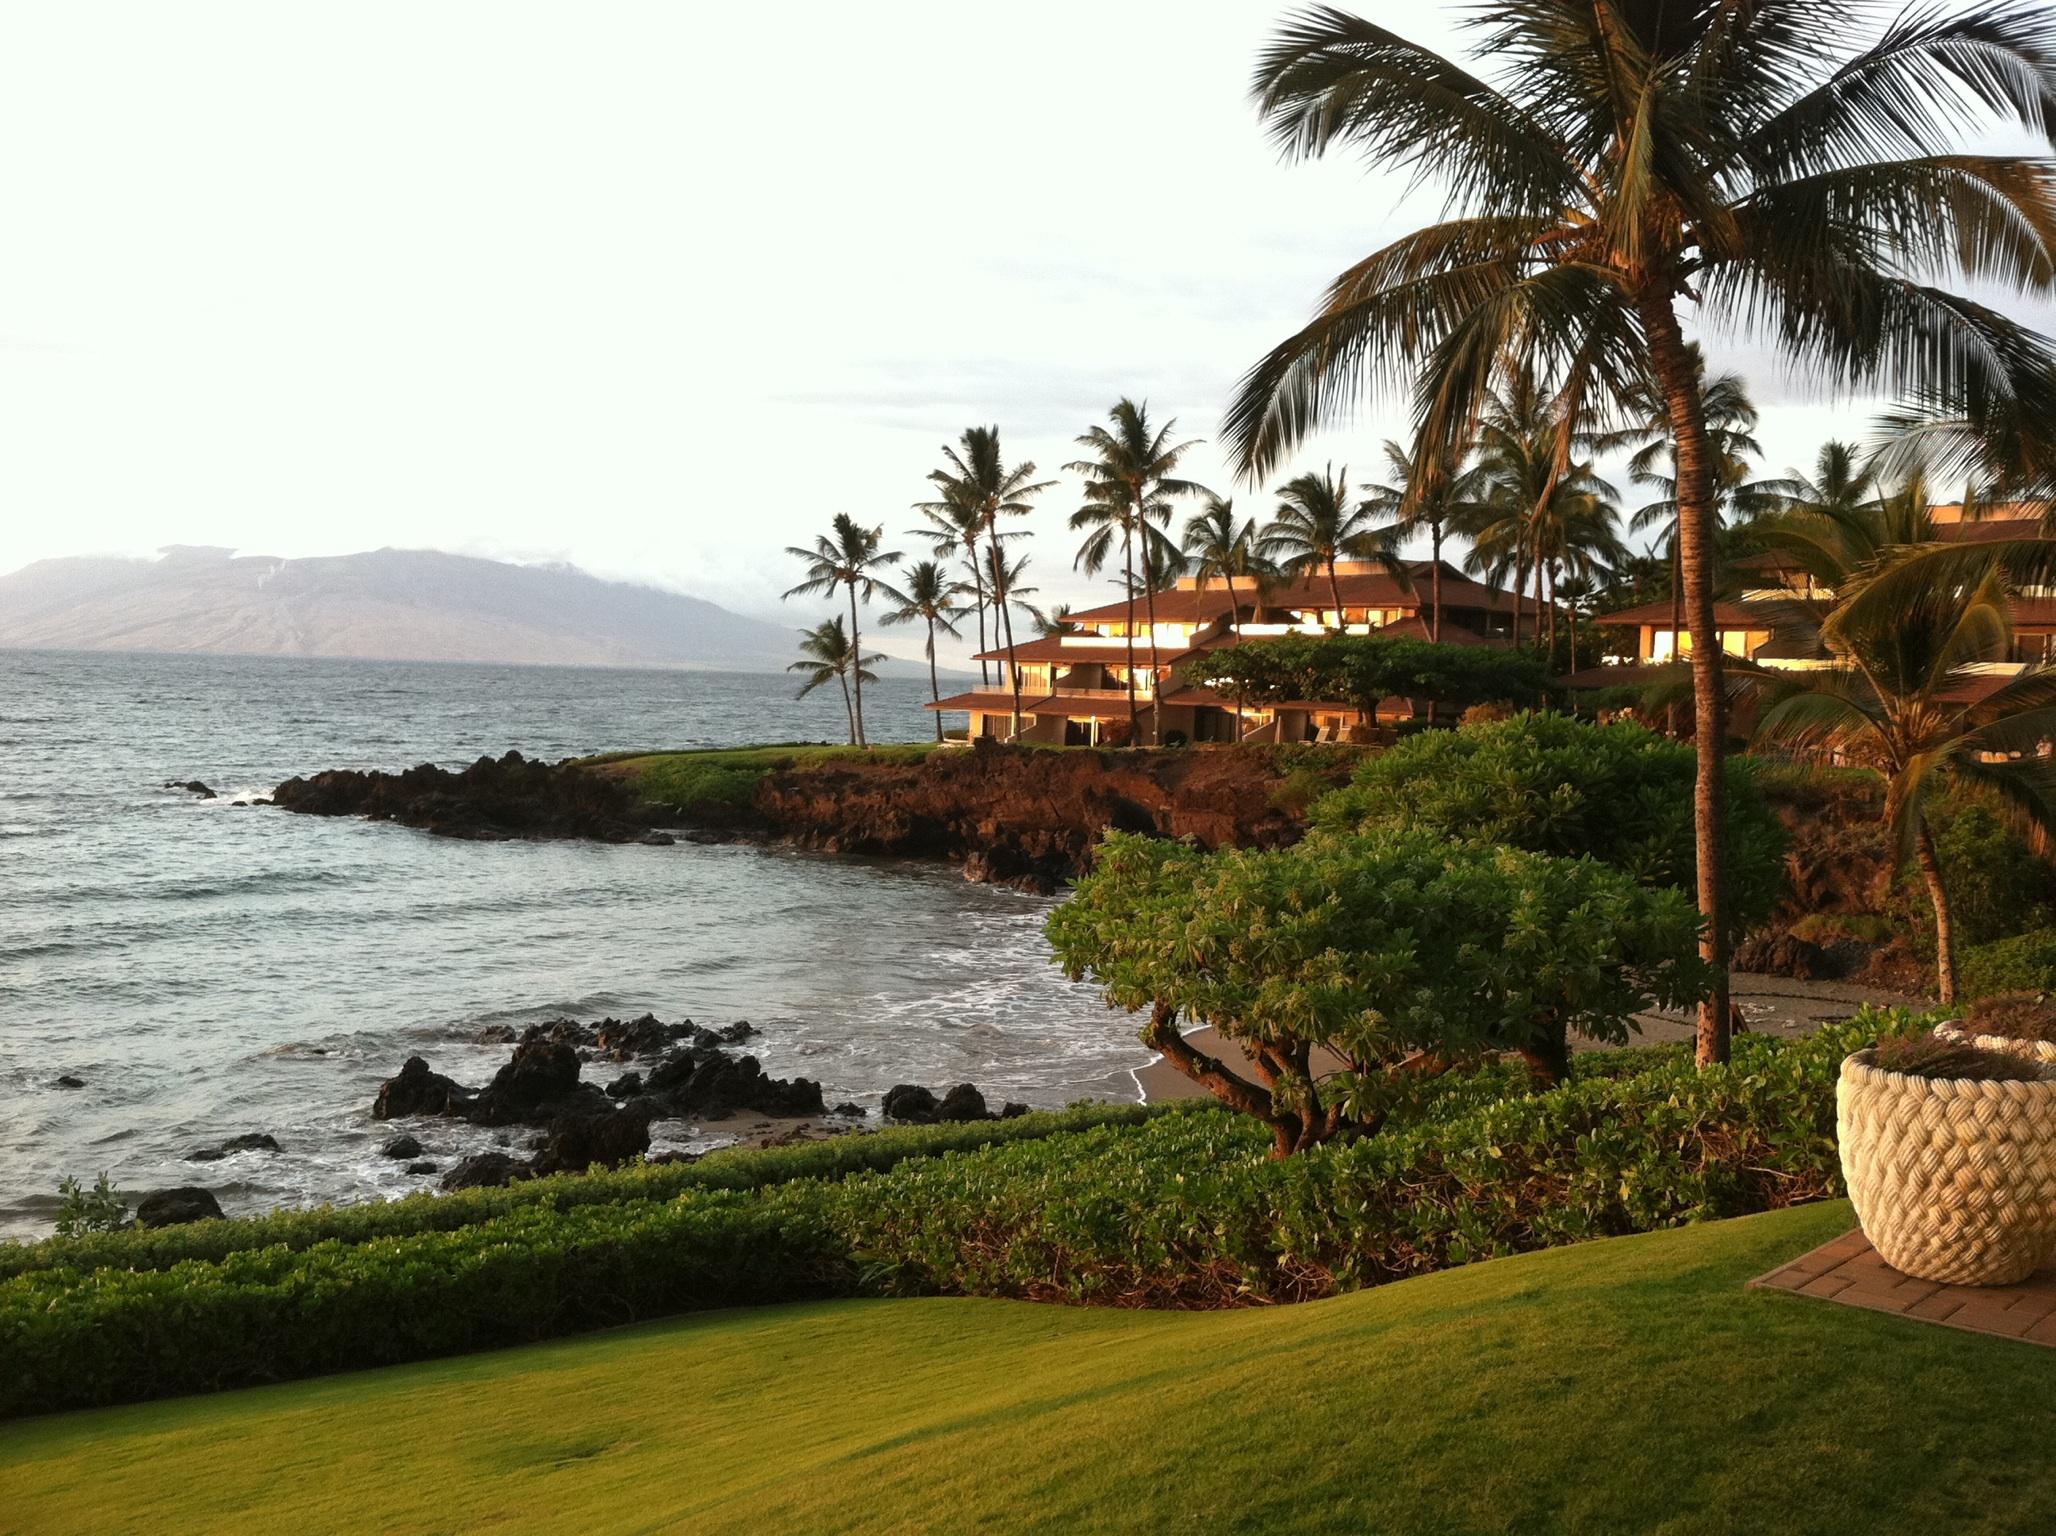 Beautiful Hawaiian sunset overlooking the Pacifc Ocean in Maui backyard